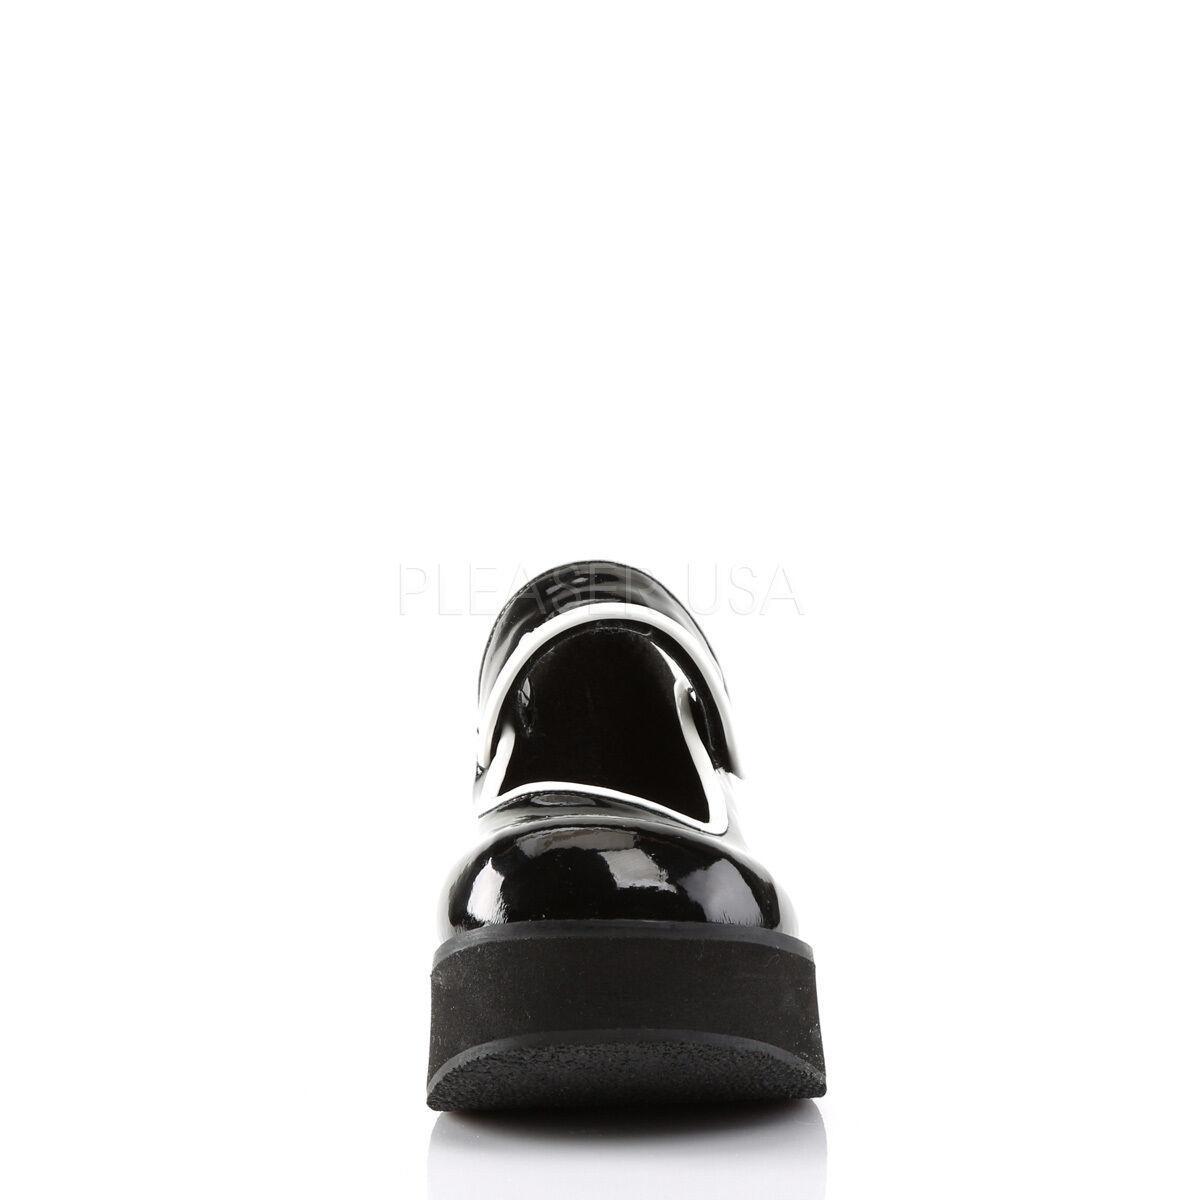 Demonia Sprite 01 Black White Strap Goth Goth Goth Punk Rockabilly Cyber Platform shoes 511650